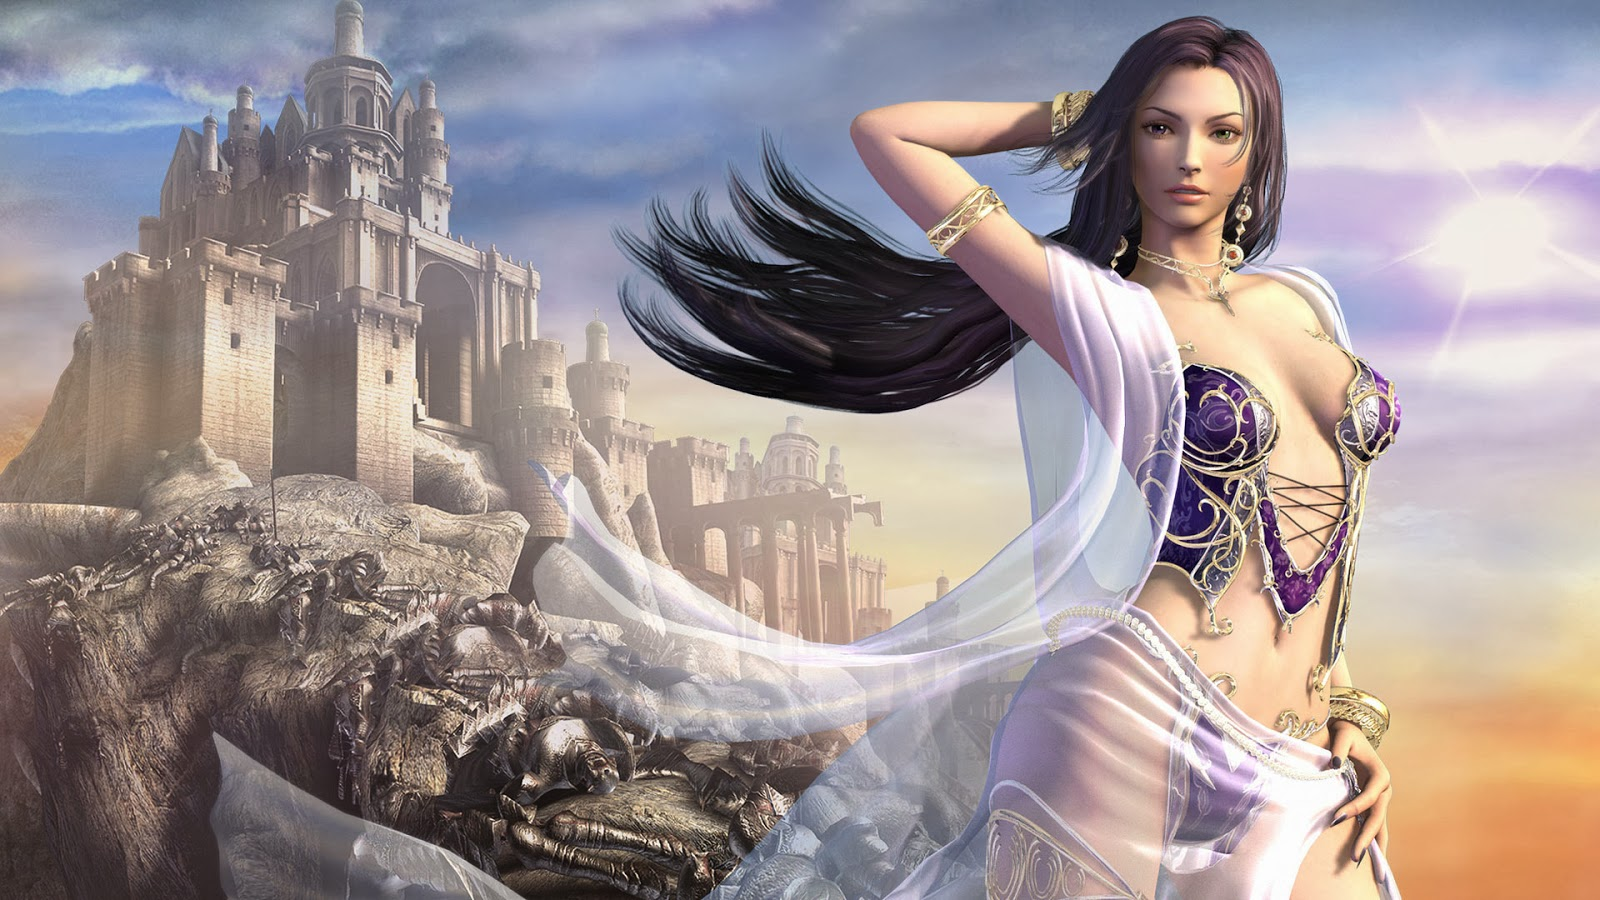 3D Fantasy Girls HD Wallpapers